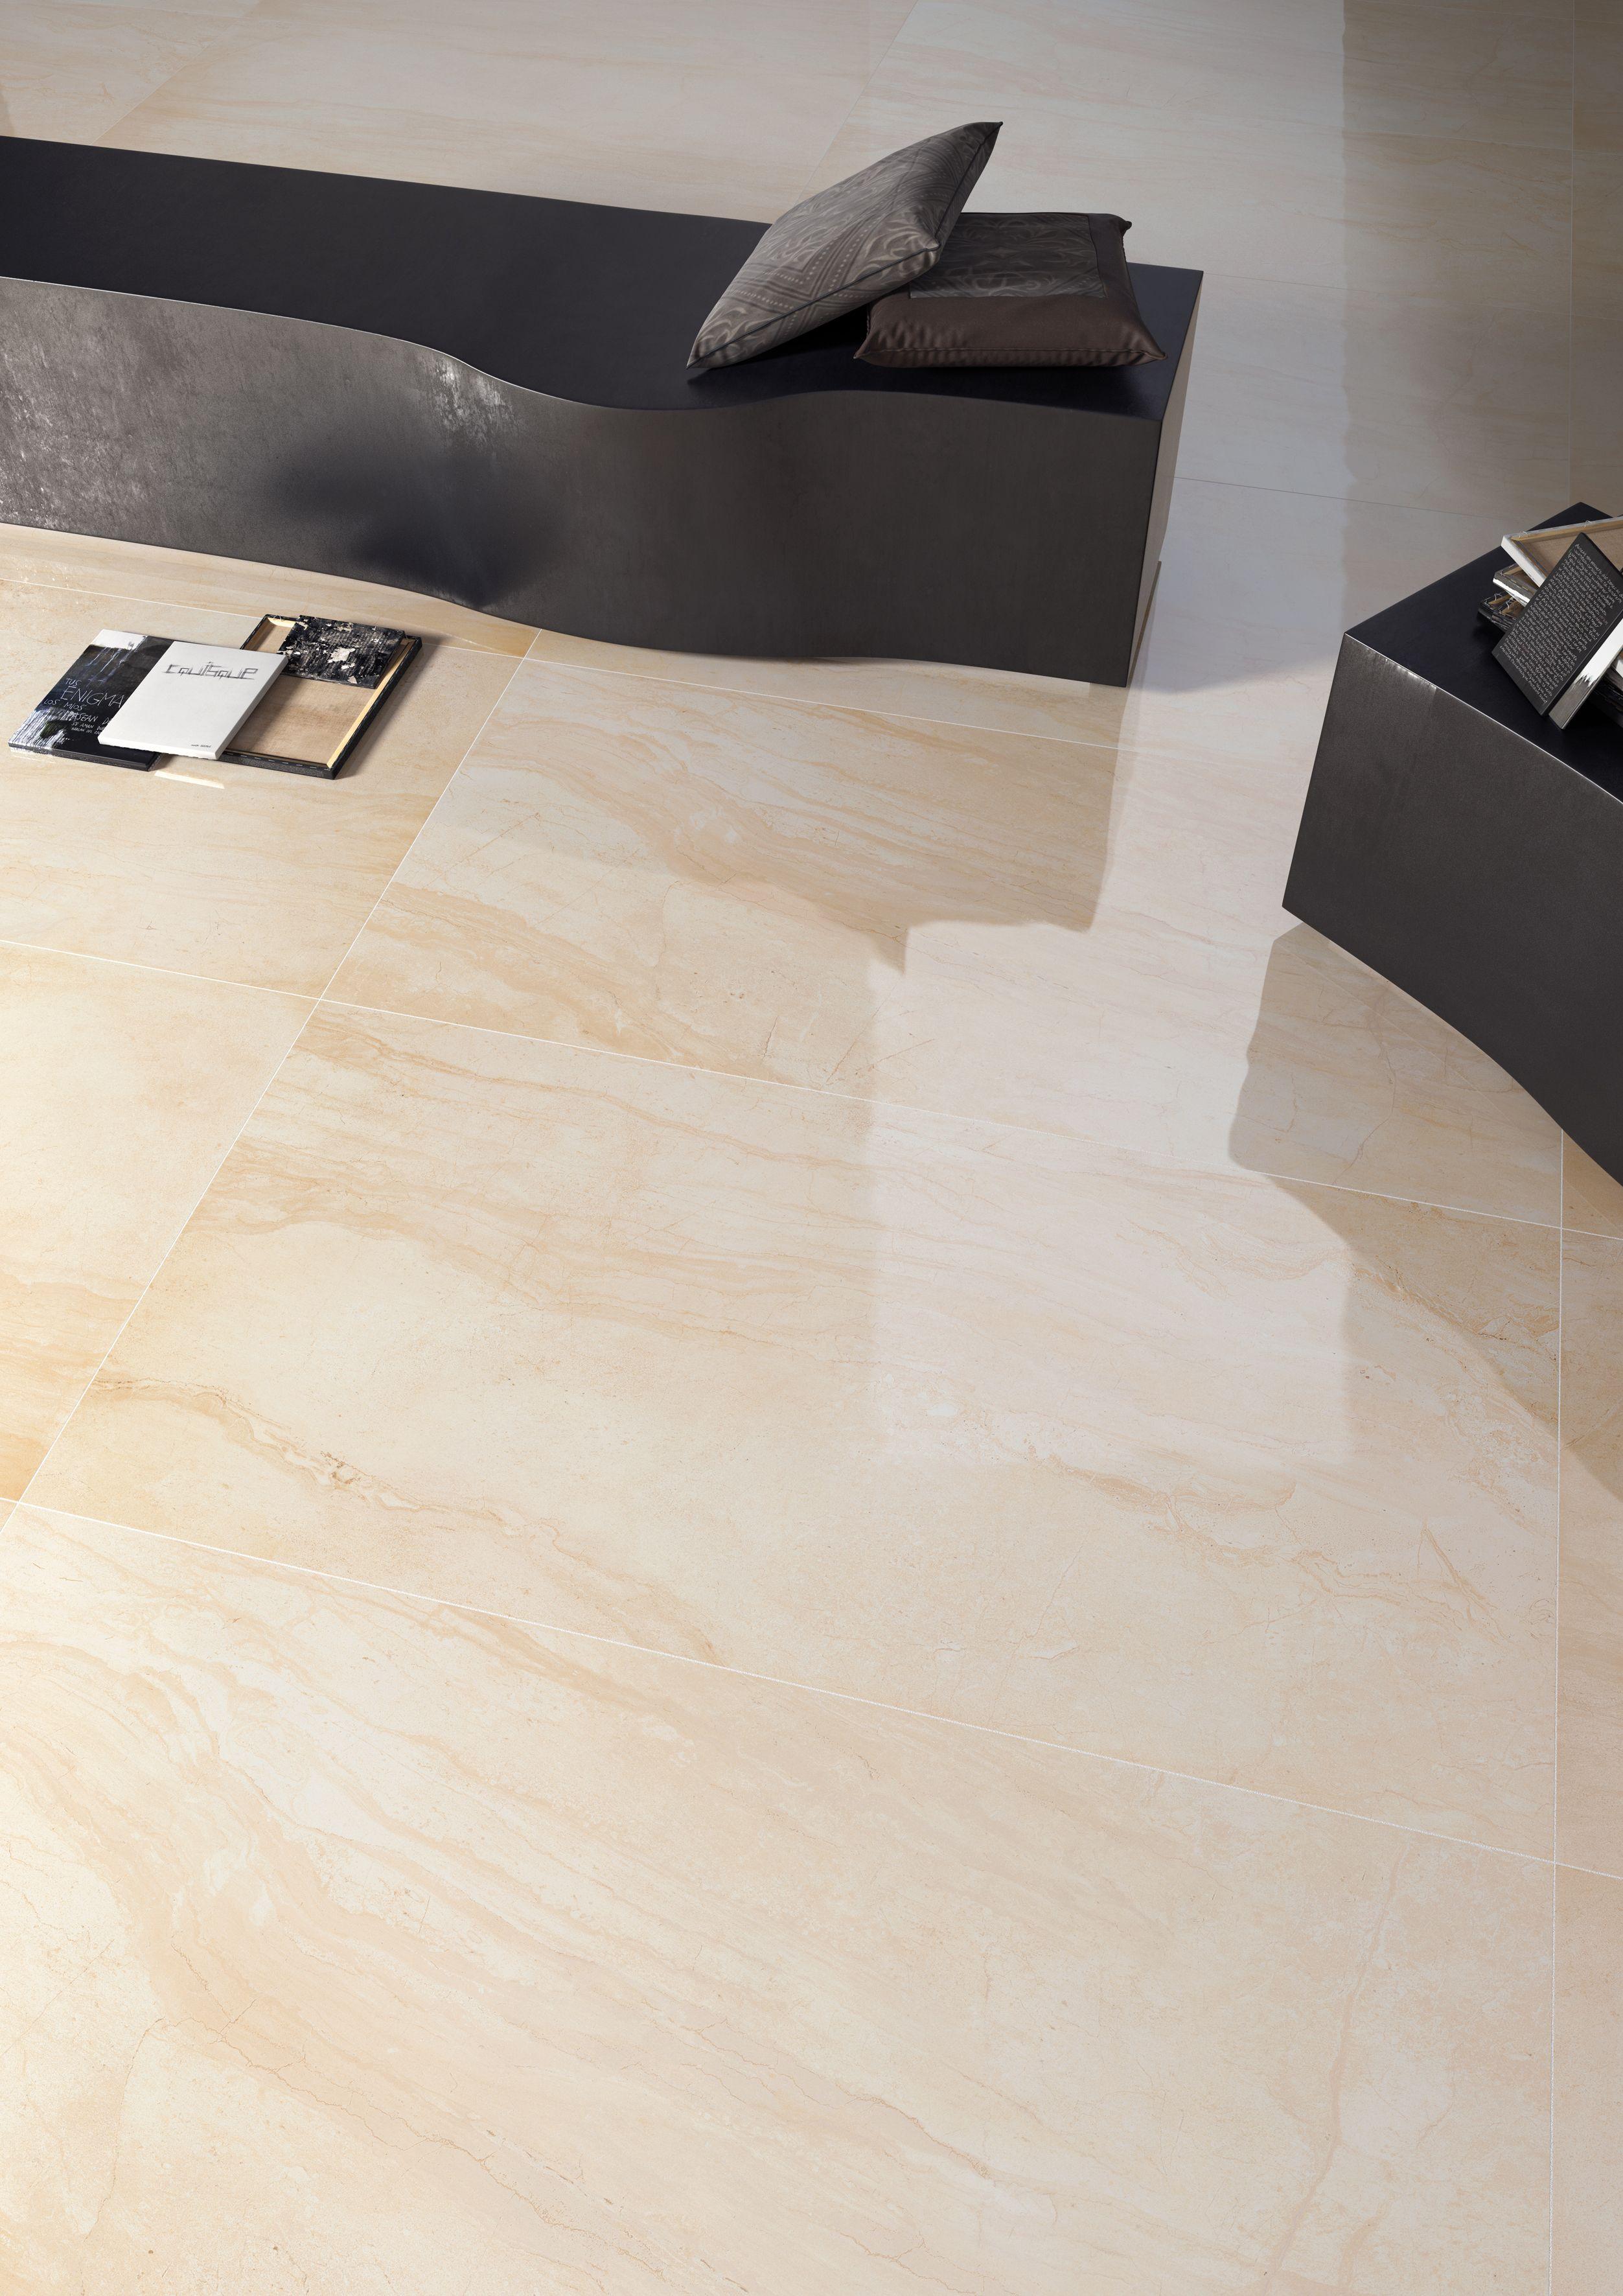 Carrelage Imitation Bois Brillant carrelage imitation marbre 78,5x78,5 monviso poli brillant